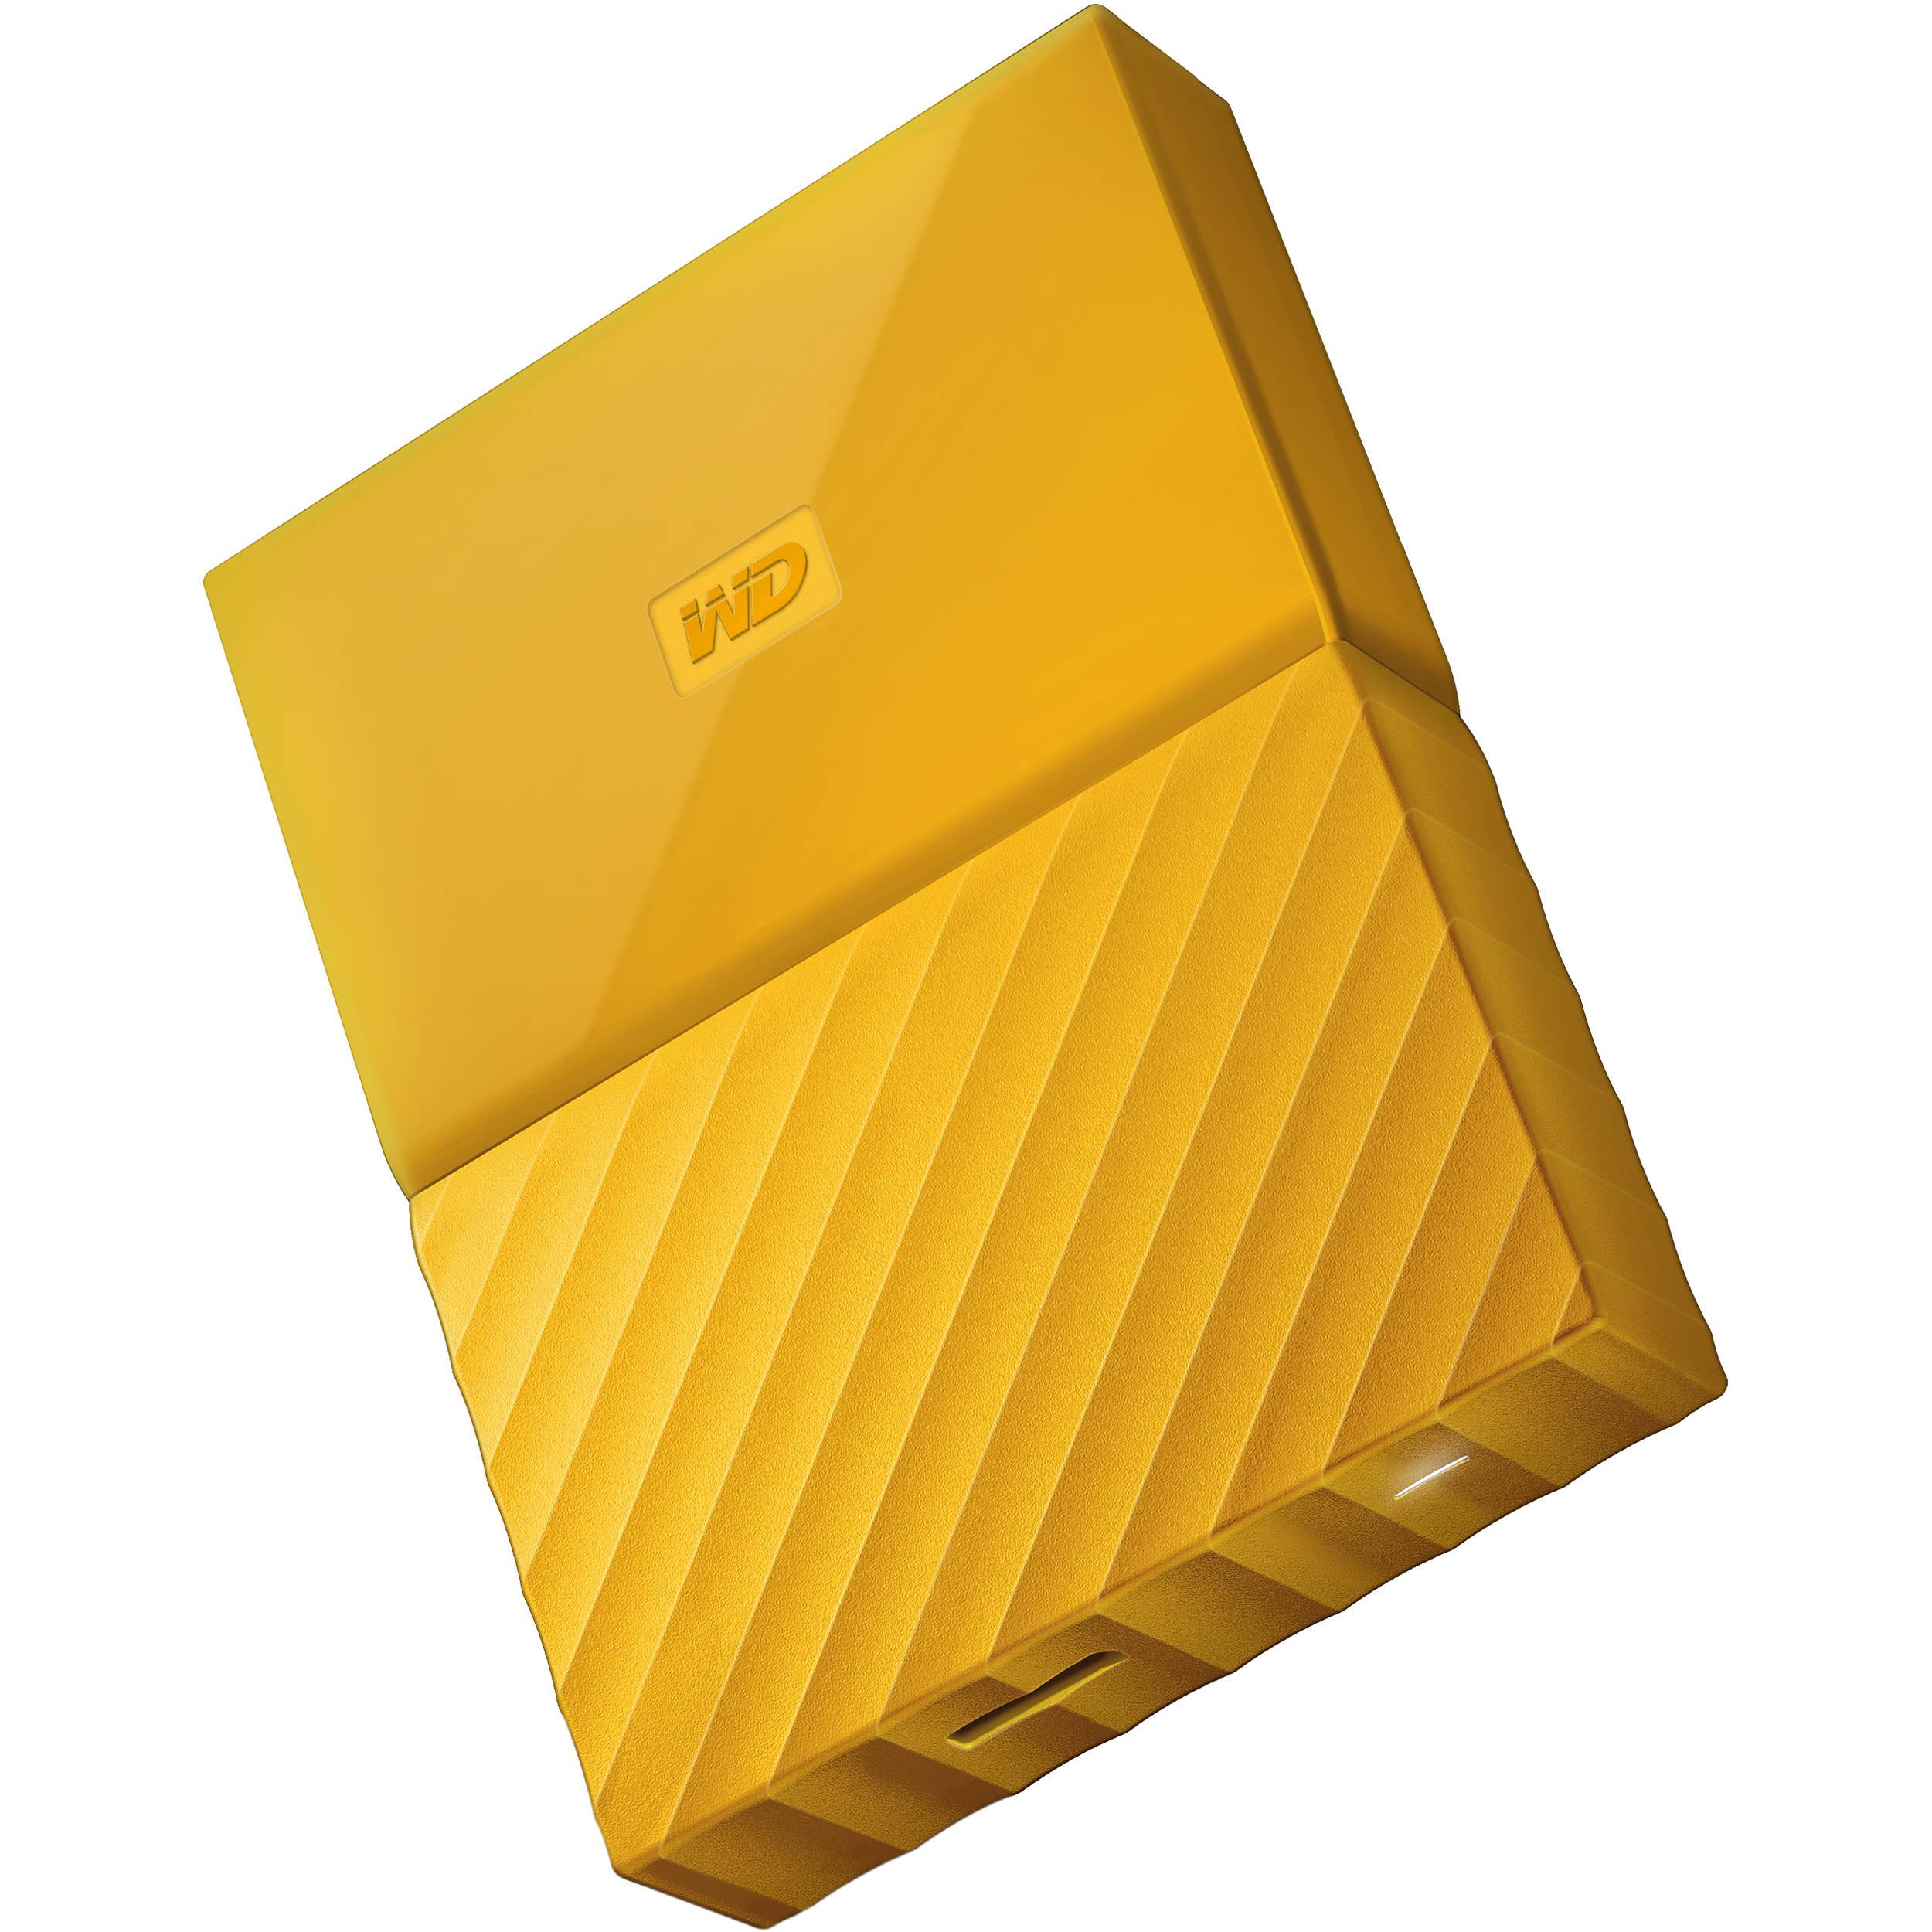 WD 2TB My Passport USB 3 0 Secure Portable Hard Drive (Yellow)